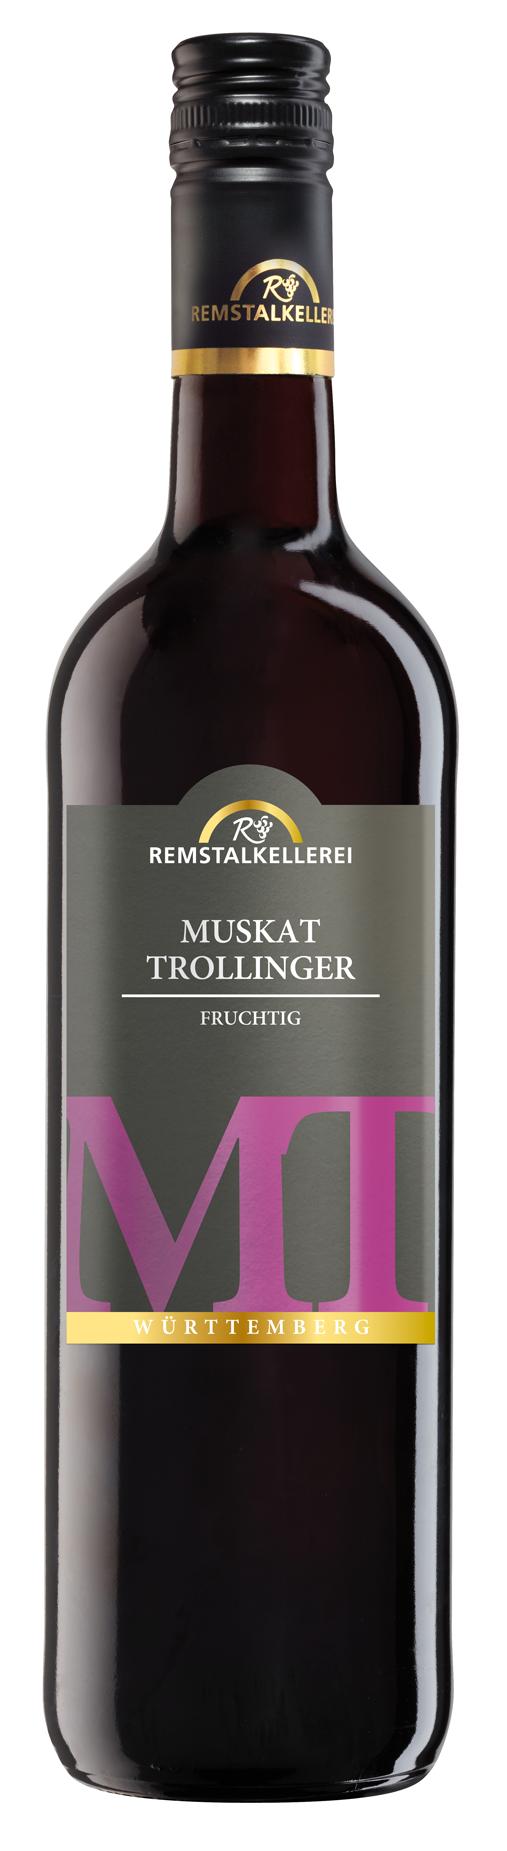 "Muskattrollinger ""MT"" fruchtig"